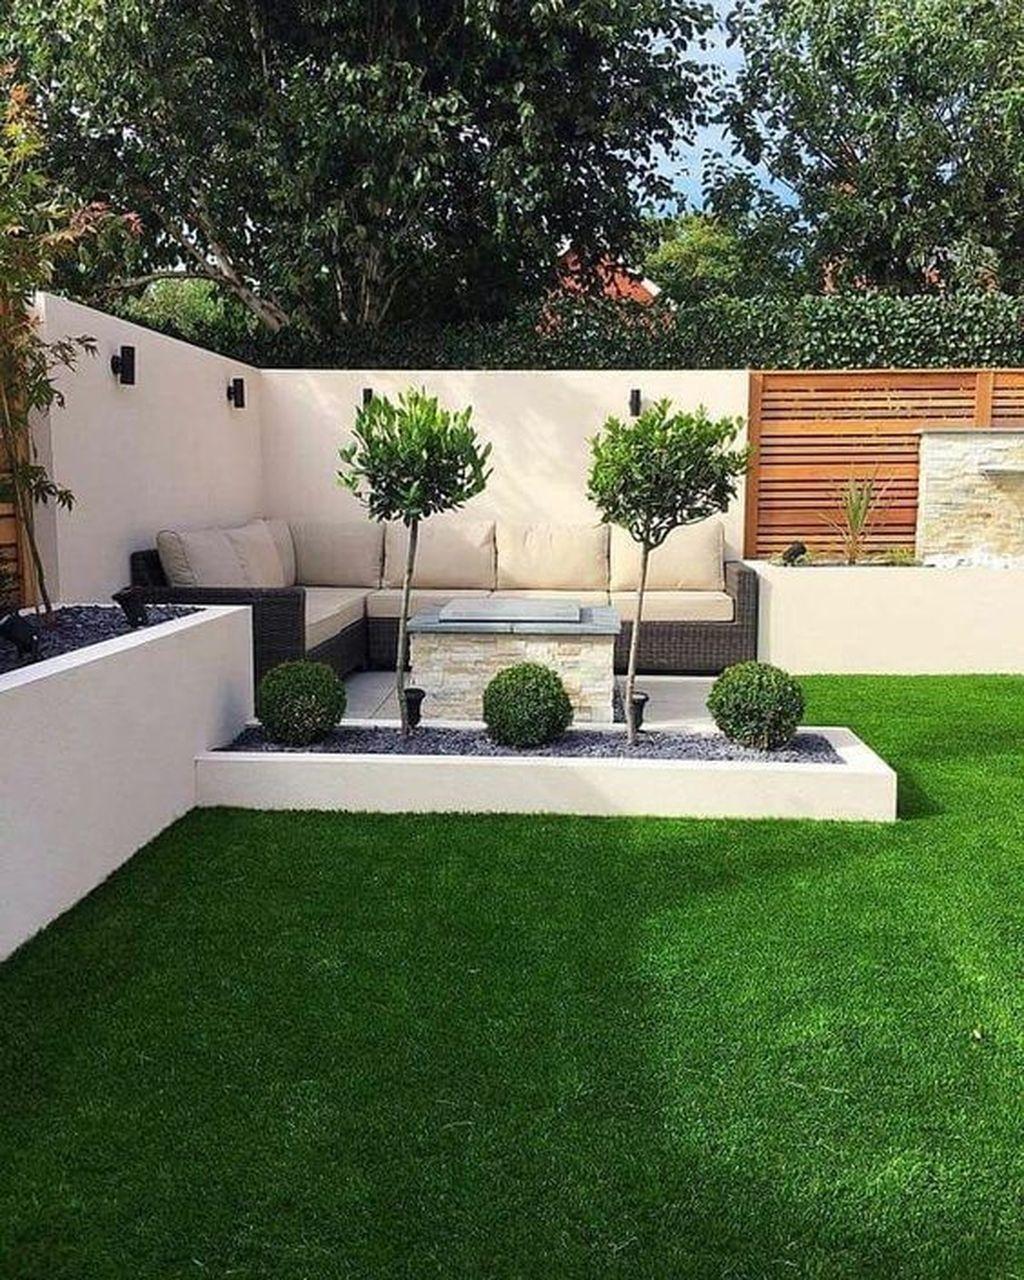 Brilliant Small Backyard Design Ideas On A Budget 30